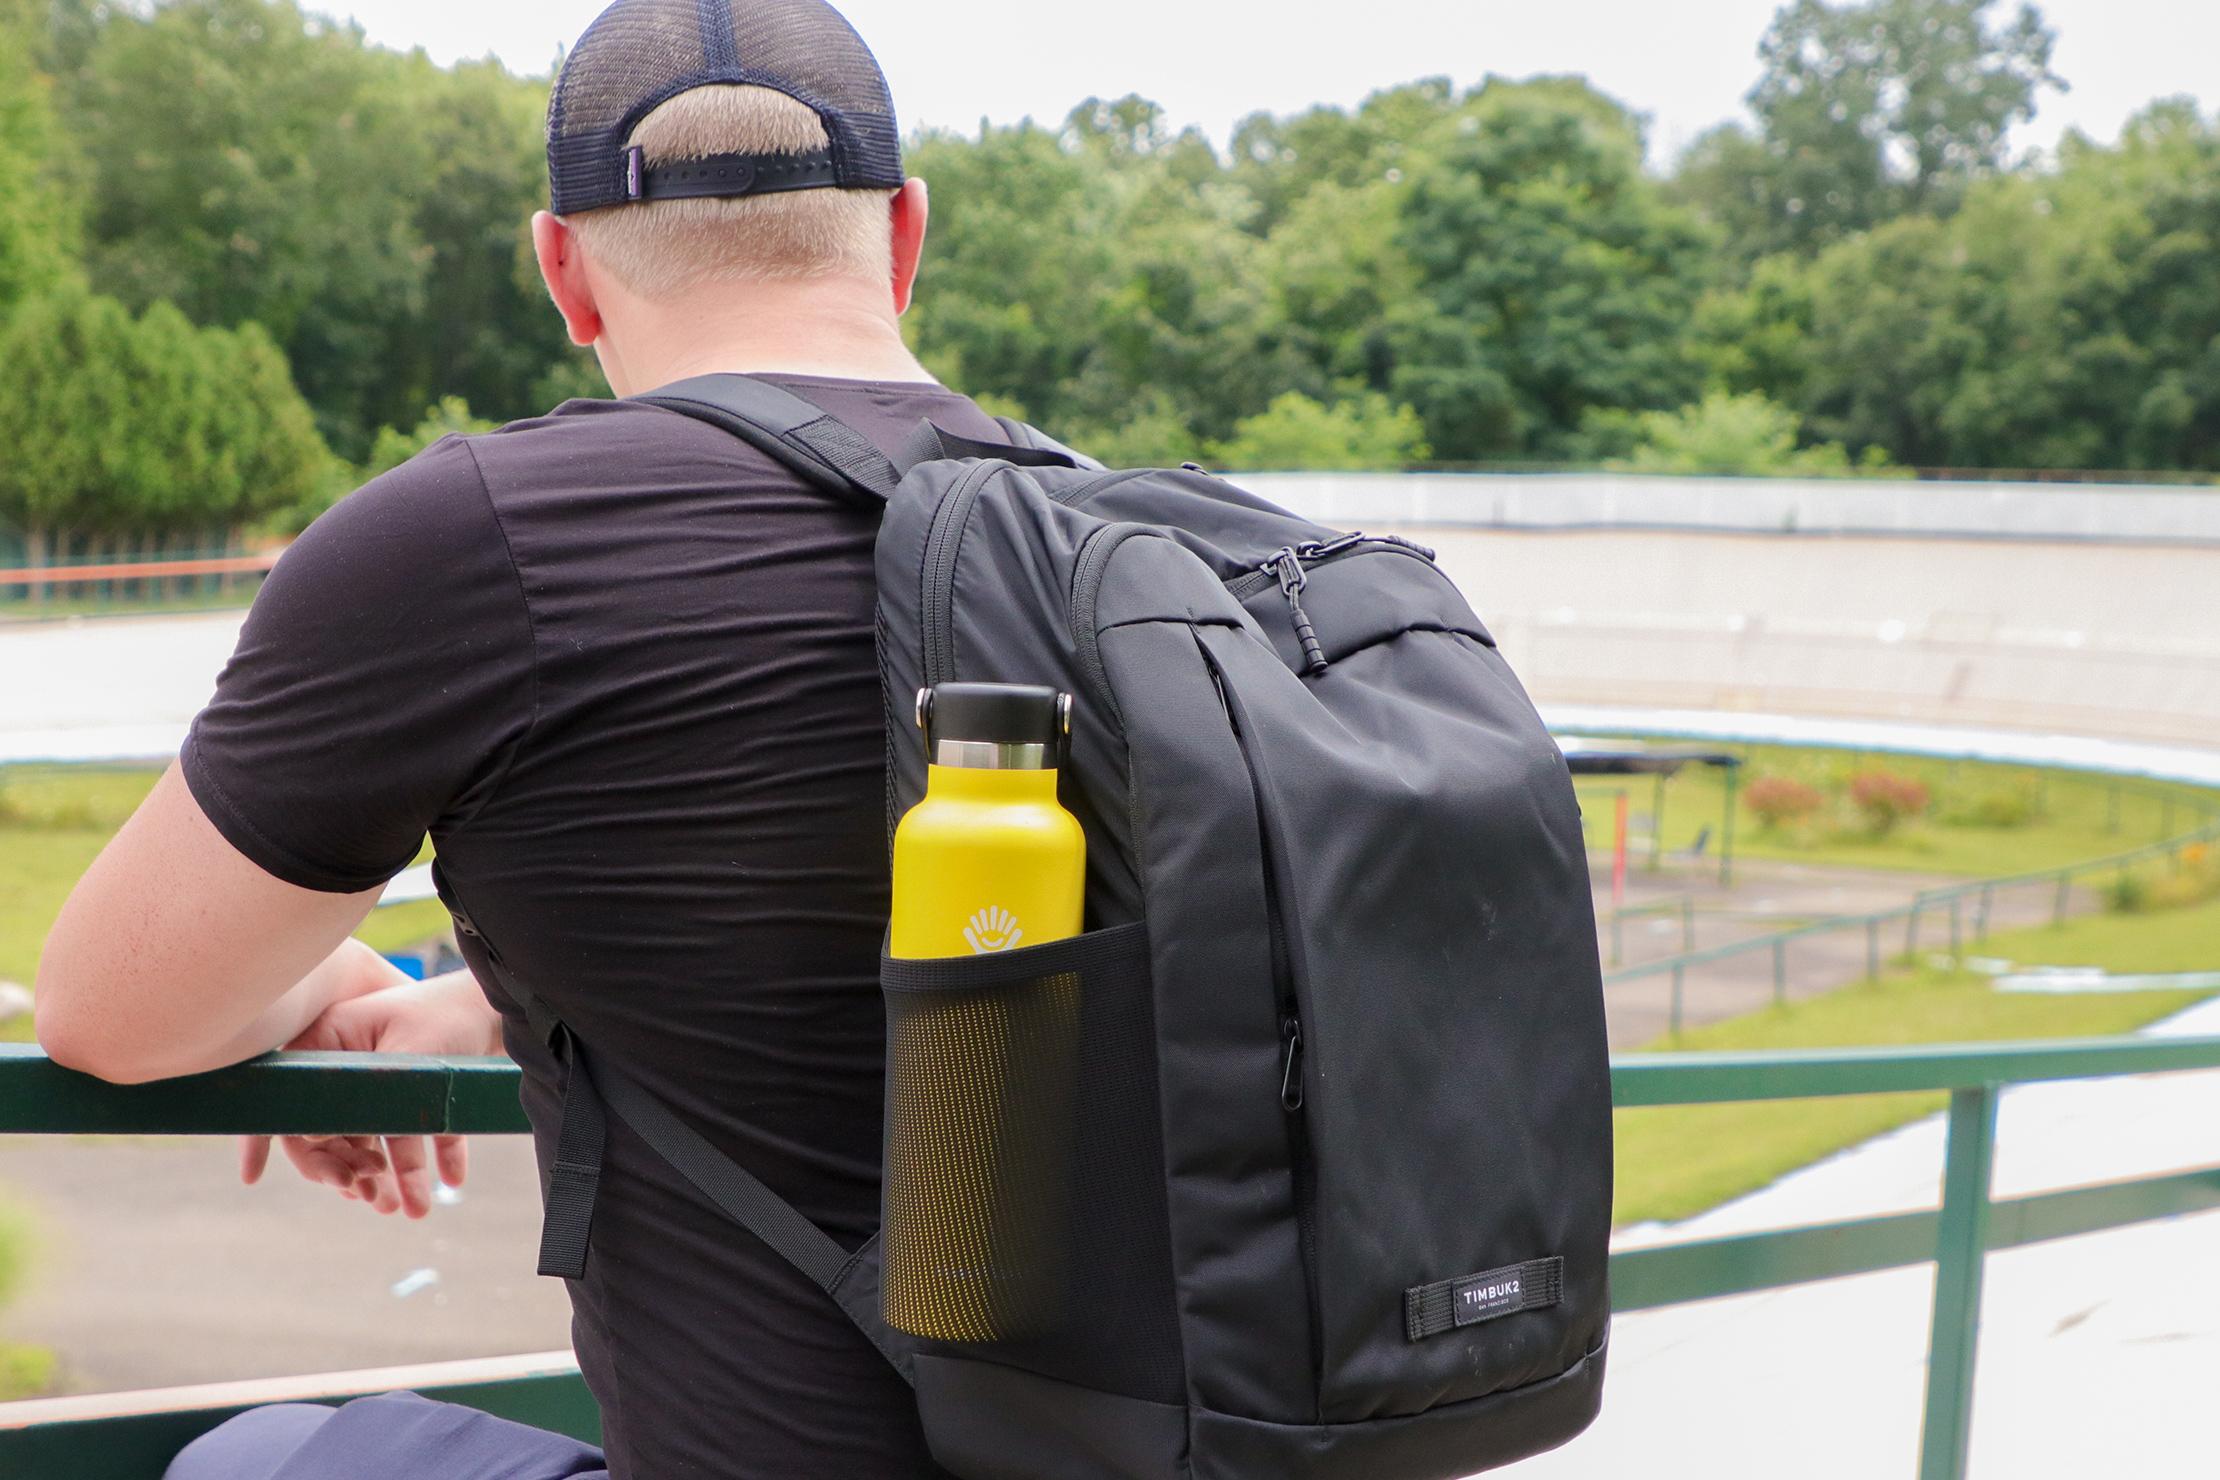 Timbuk2 Parkside Laptop Backpack 2.0 Usage 1